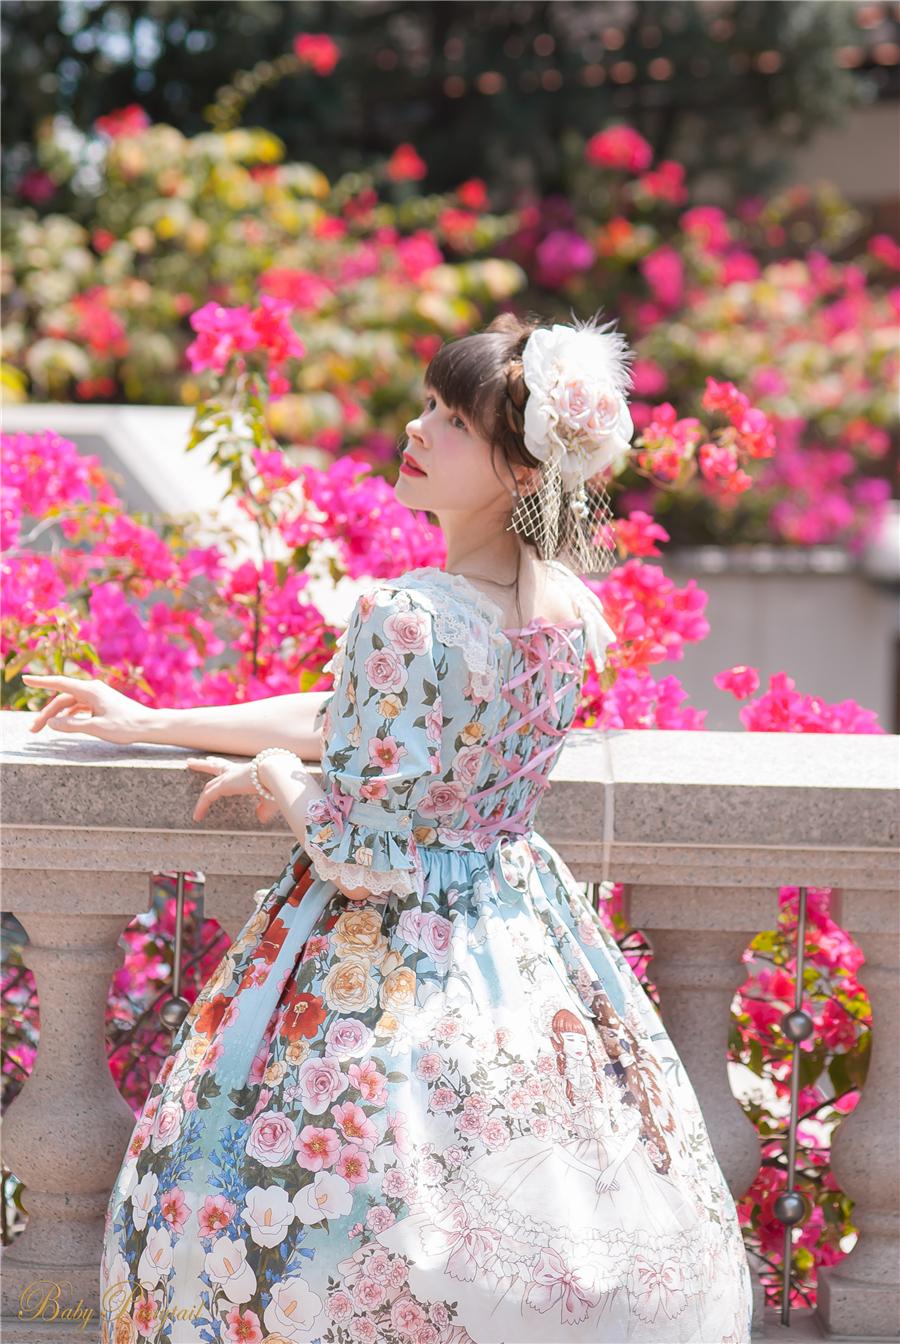 Baby Ponytail_Model Photo_Polly's Garden of Dreams_OP Lagoon Blue_Claudia_20.jpg